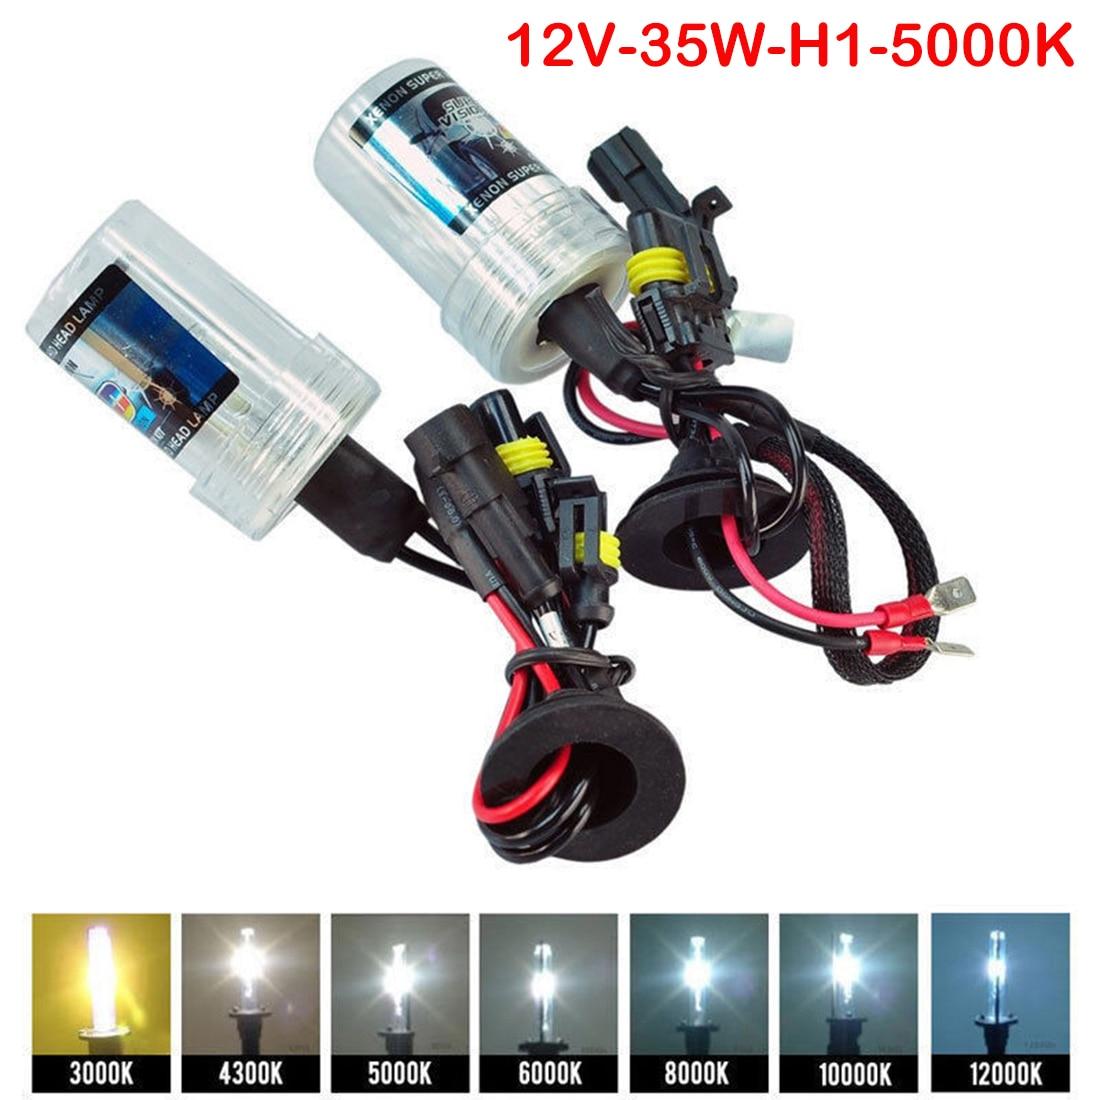 H1 H3 H7 H11 9005 9006 880 35W 55W HID Xenon Bulb Auto Car Headlight Lamp 3000k 4300k 5000k 6000k 8000k 10000k 12000k